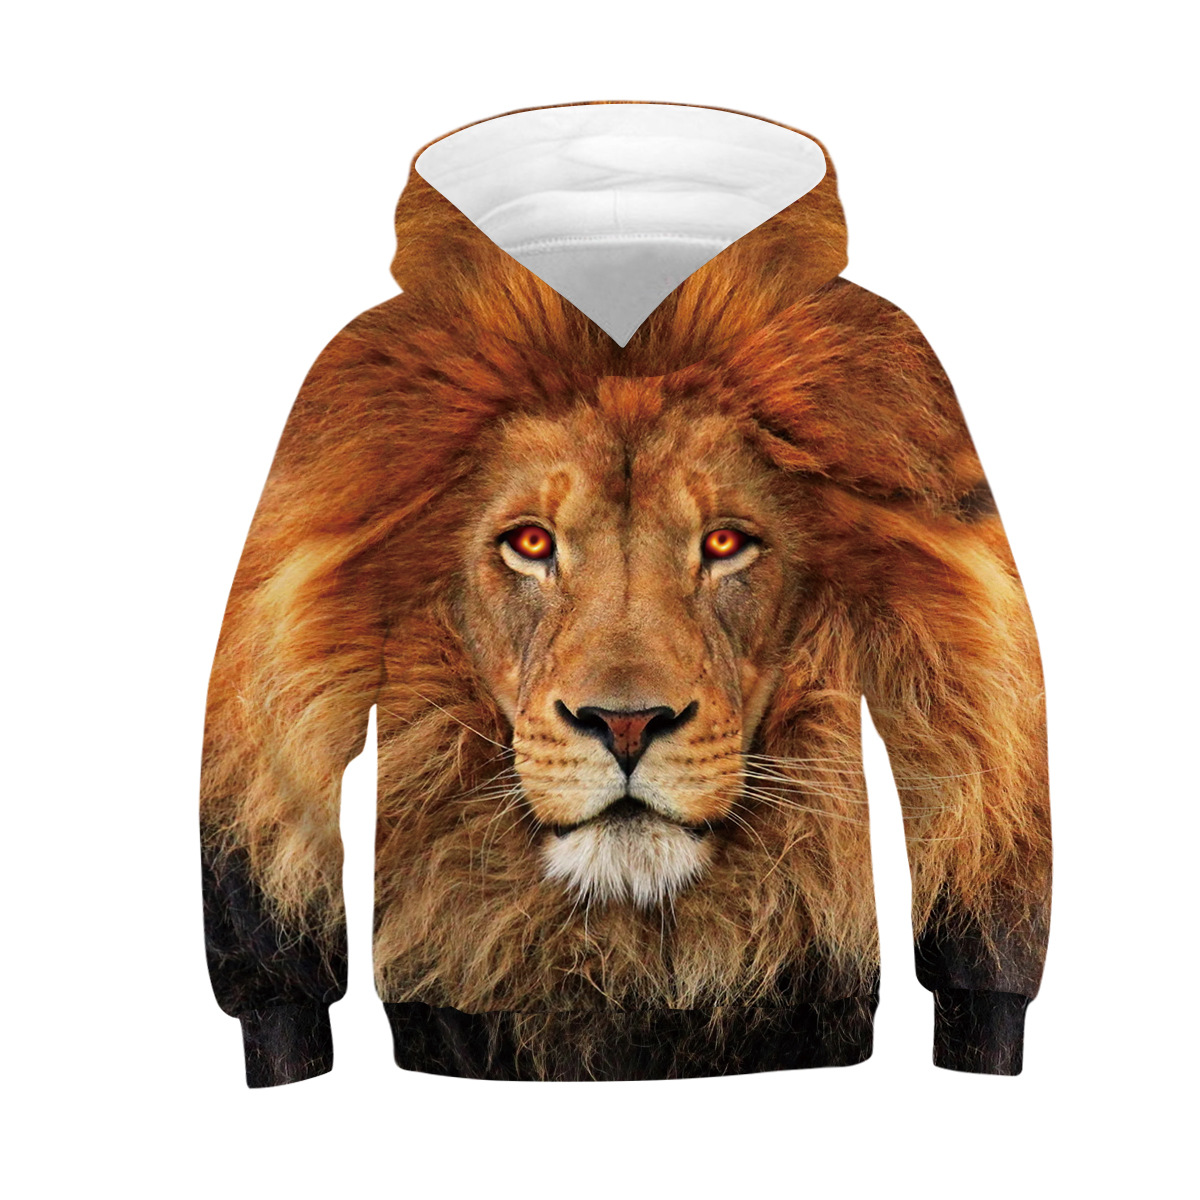 Wolf Tiger 3D Print Boys Hoodies Teens Spring Autumn Outerwear Kids Hooded Sweatshirt Clothes Children Long Sleeve Pullover Tops 6